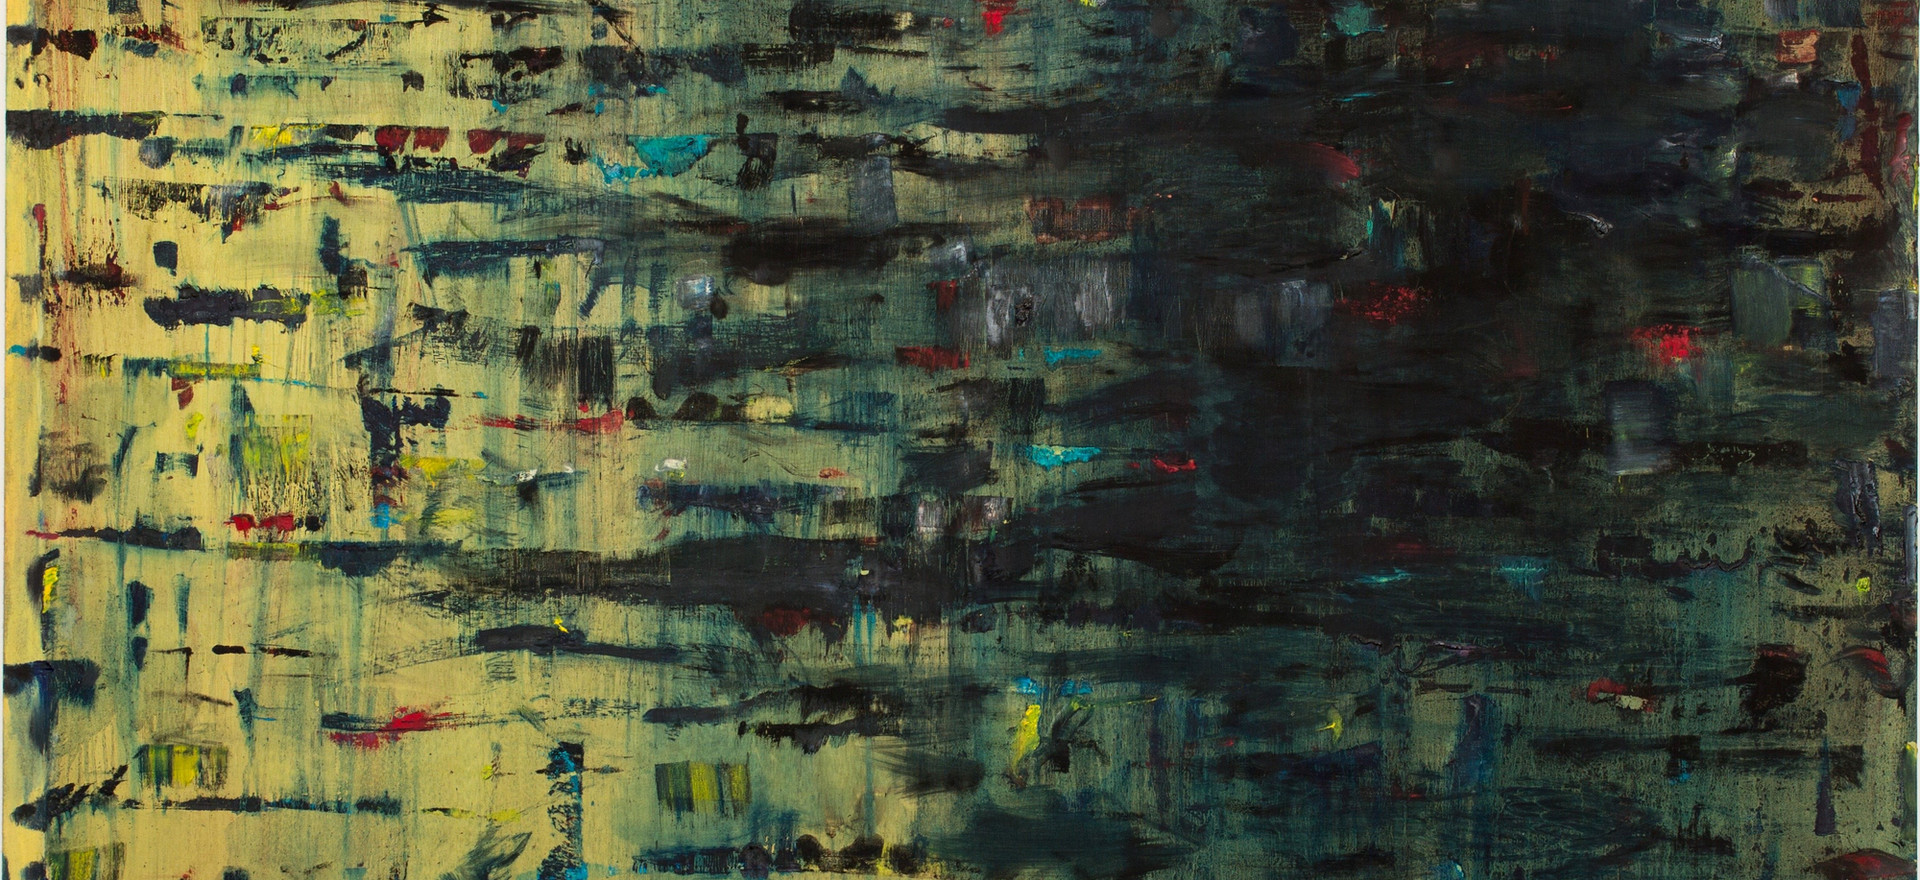 """Paisaje"", 2000, oil on canvas, 203 x 203 cm."